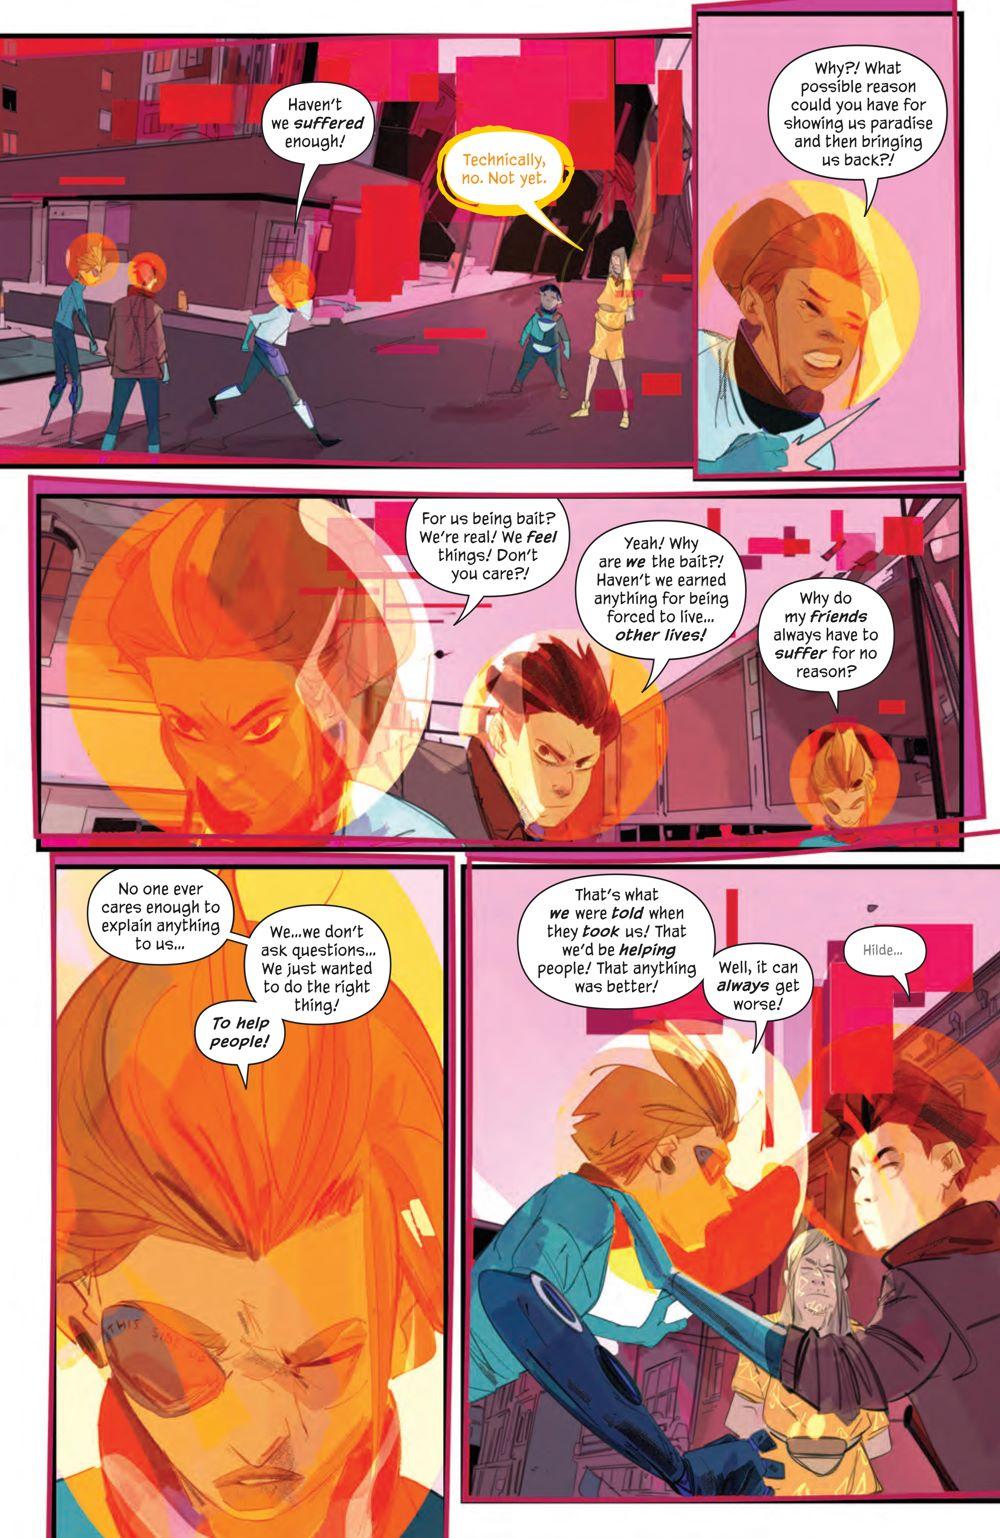 GoodLuck_004_PRESS_6 ComicList Previews: GOOD LUCK #4 (OF 5)